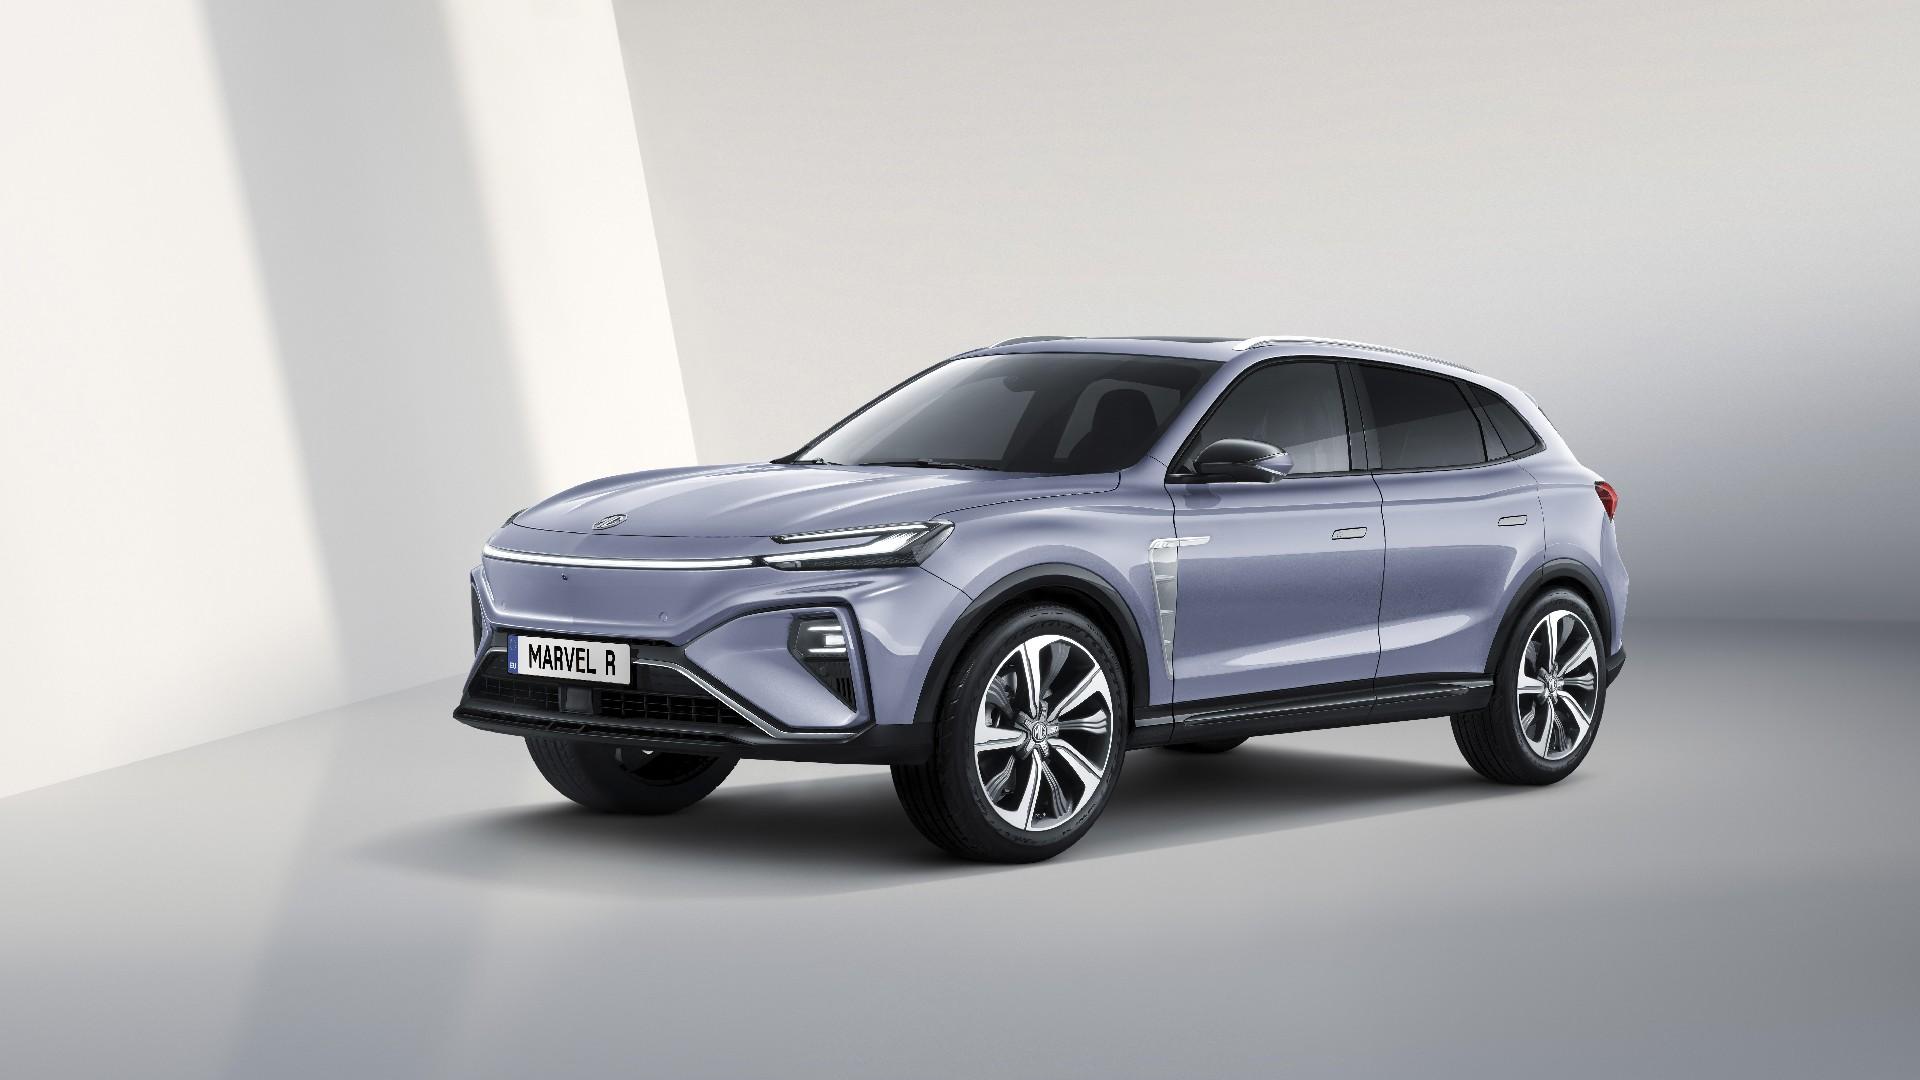 MG vuelve a España con dos nuevos modelos, cuatro en total